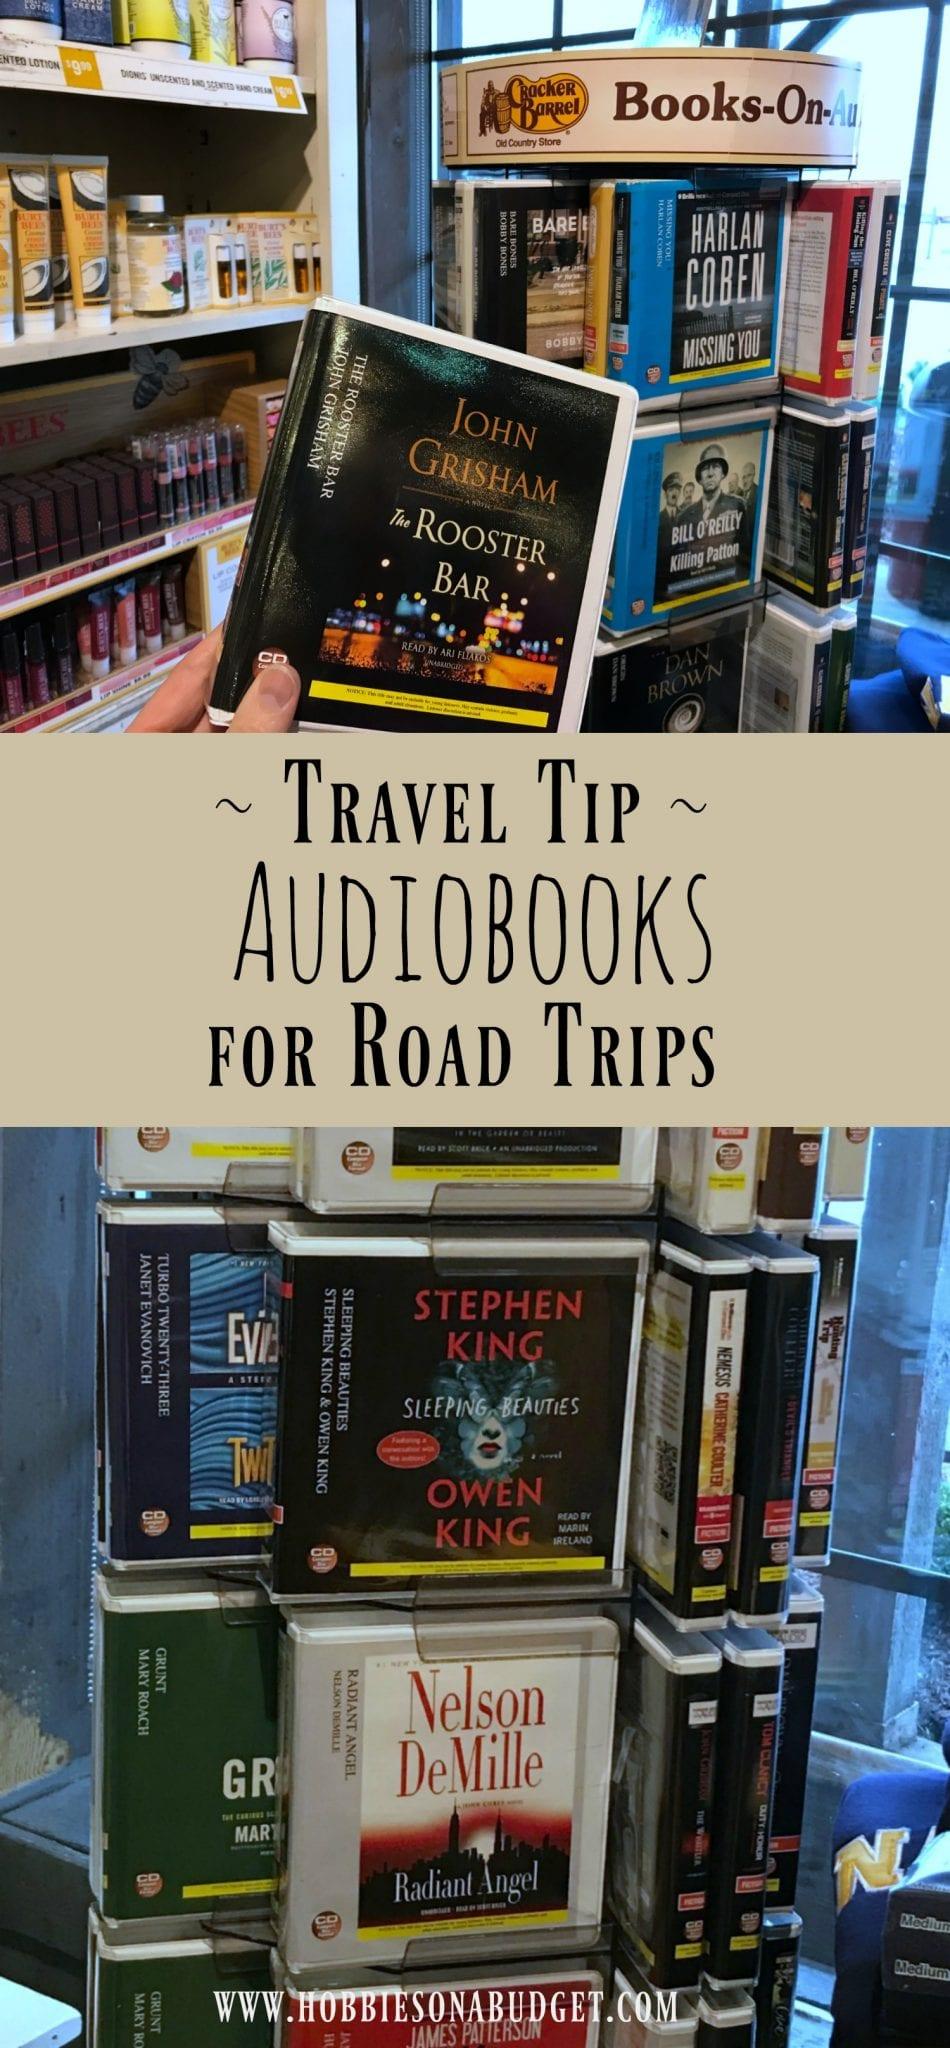 Travel tip Audiobooks for road trips